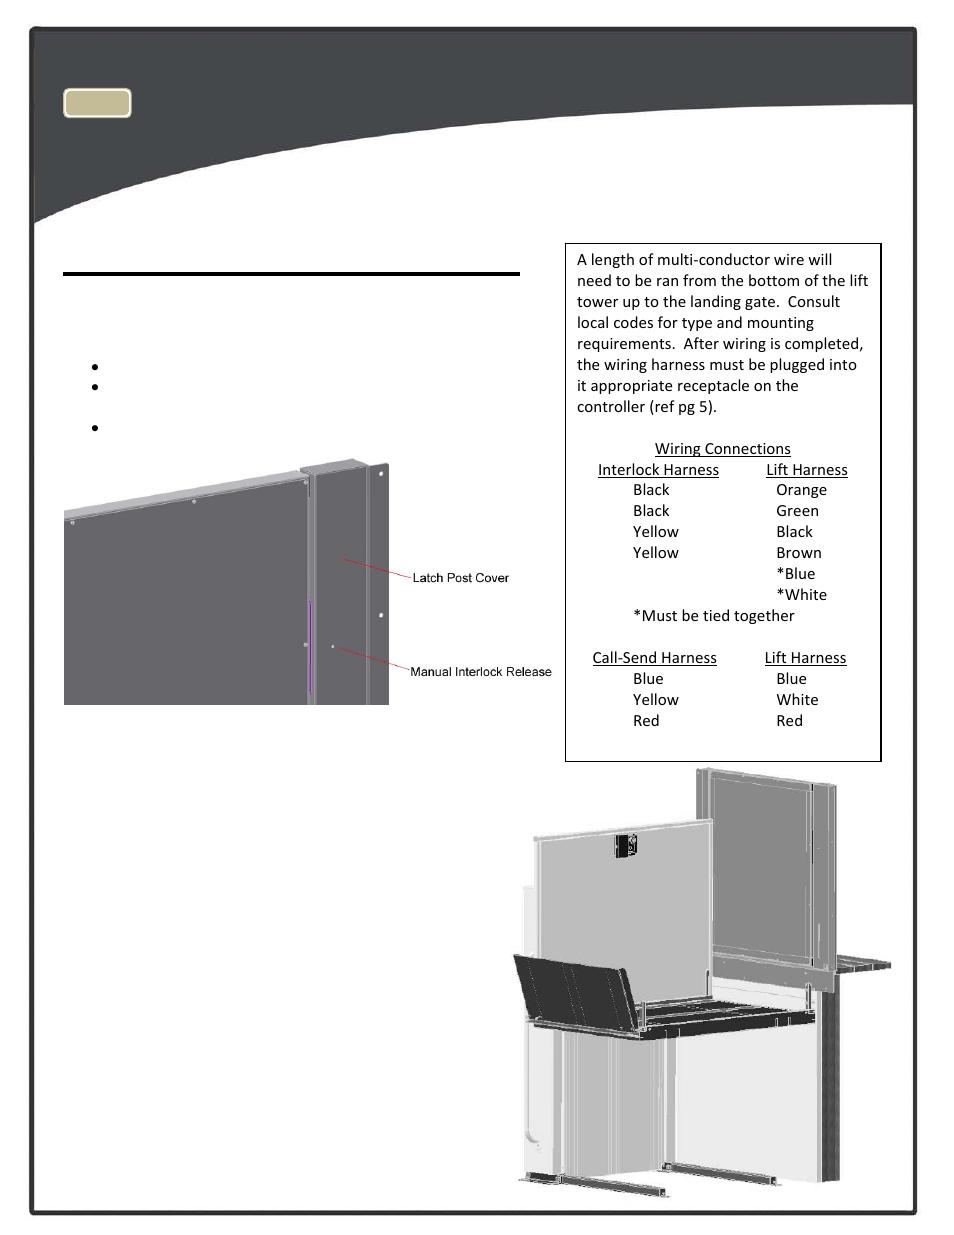 hight resolution of top landing gate optional harmar mobility highlander cpl1200 user manual page 13 22